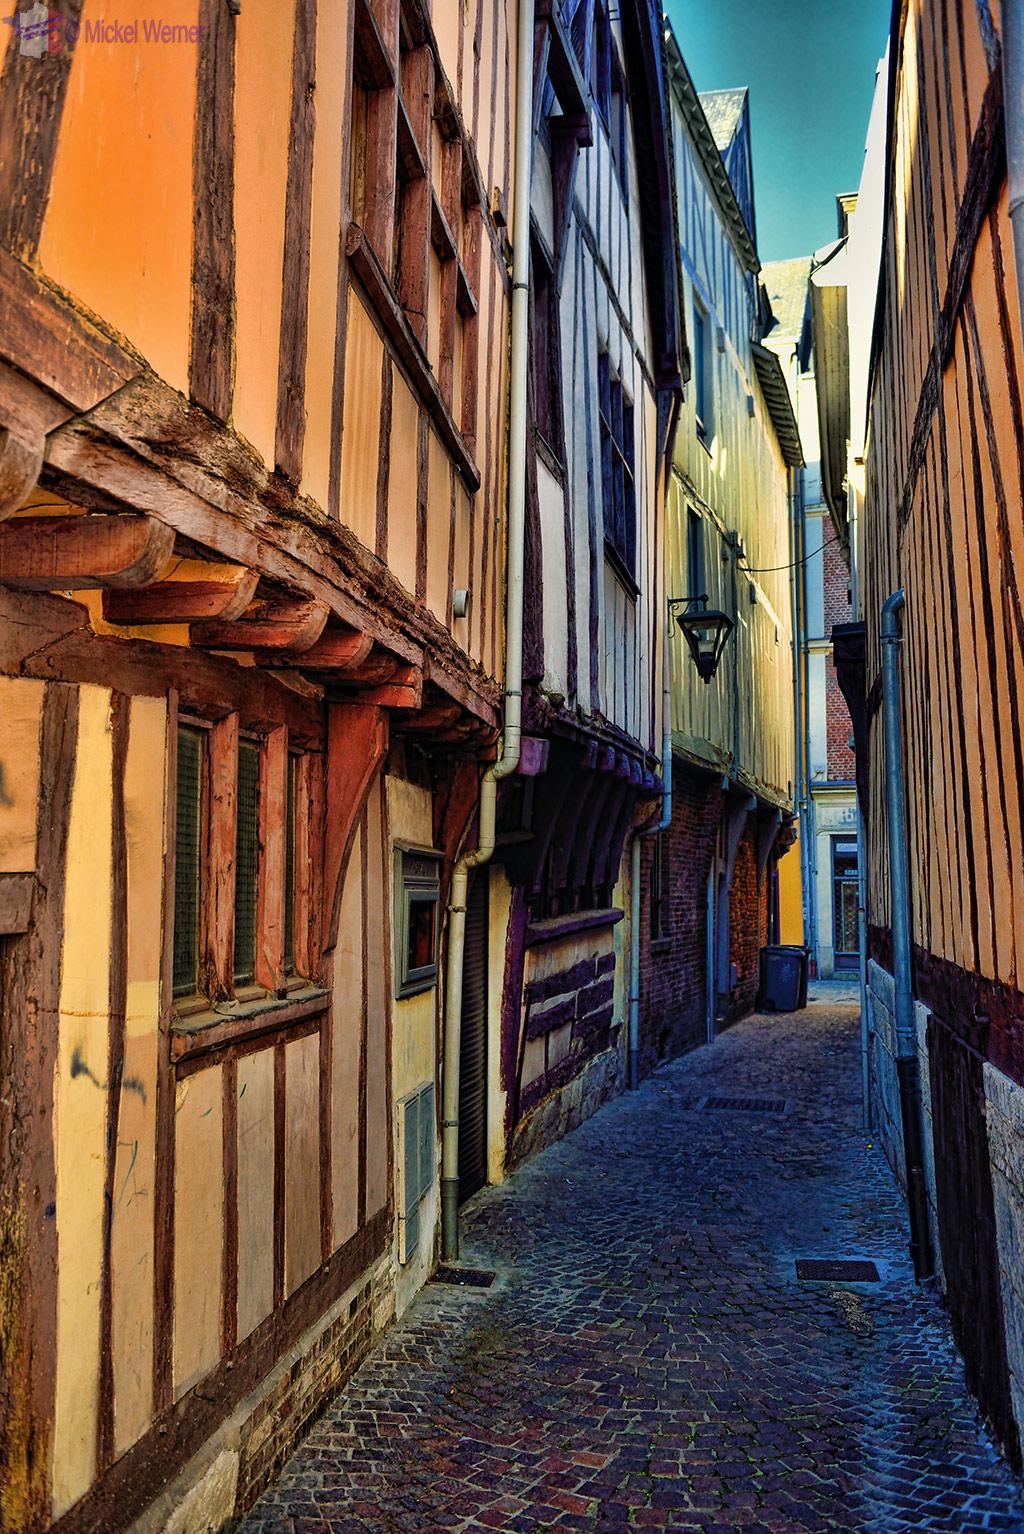 Alleyway in Rouen